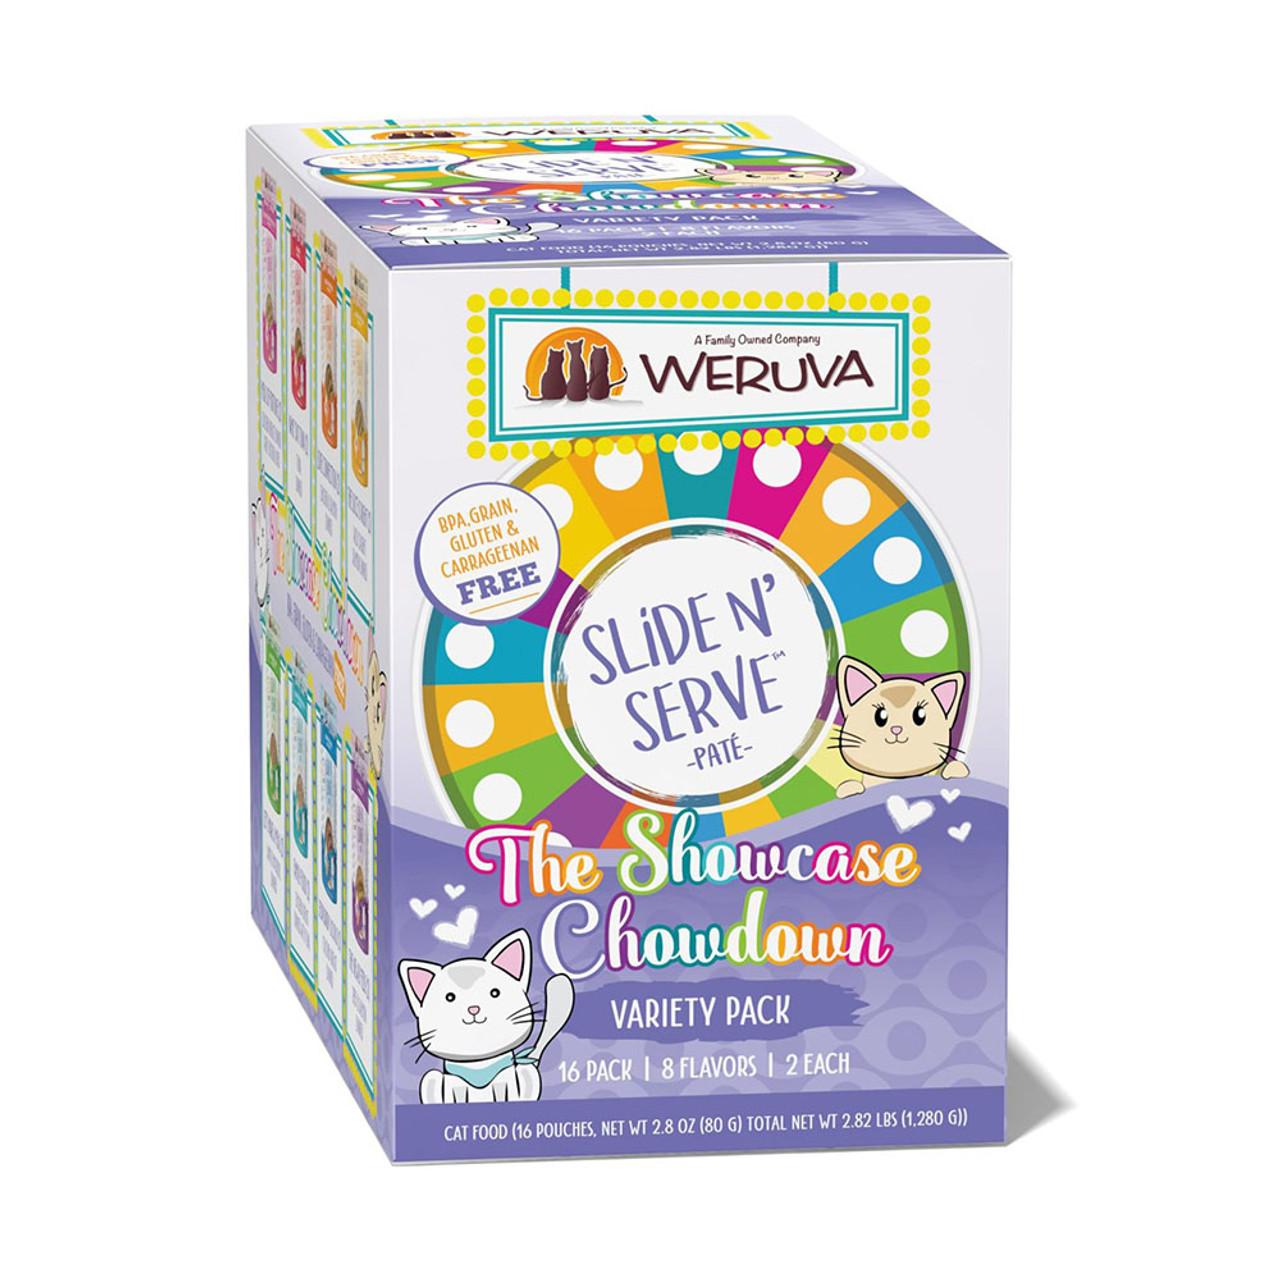 Slide N' Serve The Showcase Chowdown Variety Pack Canned Cat Food